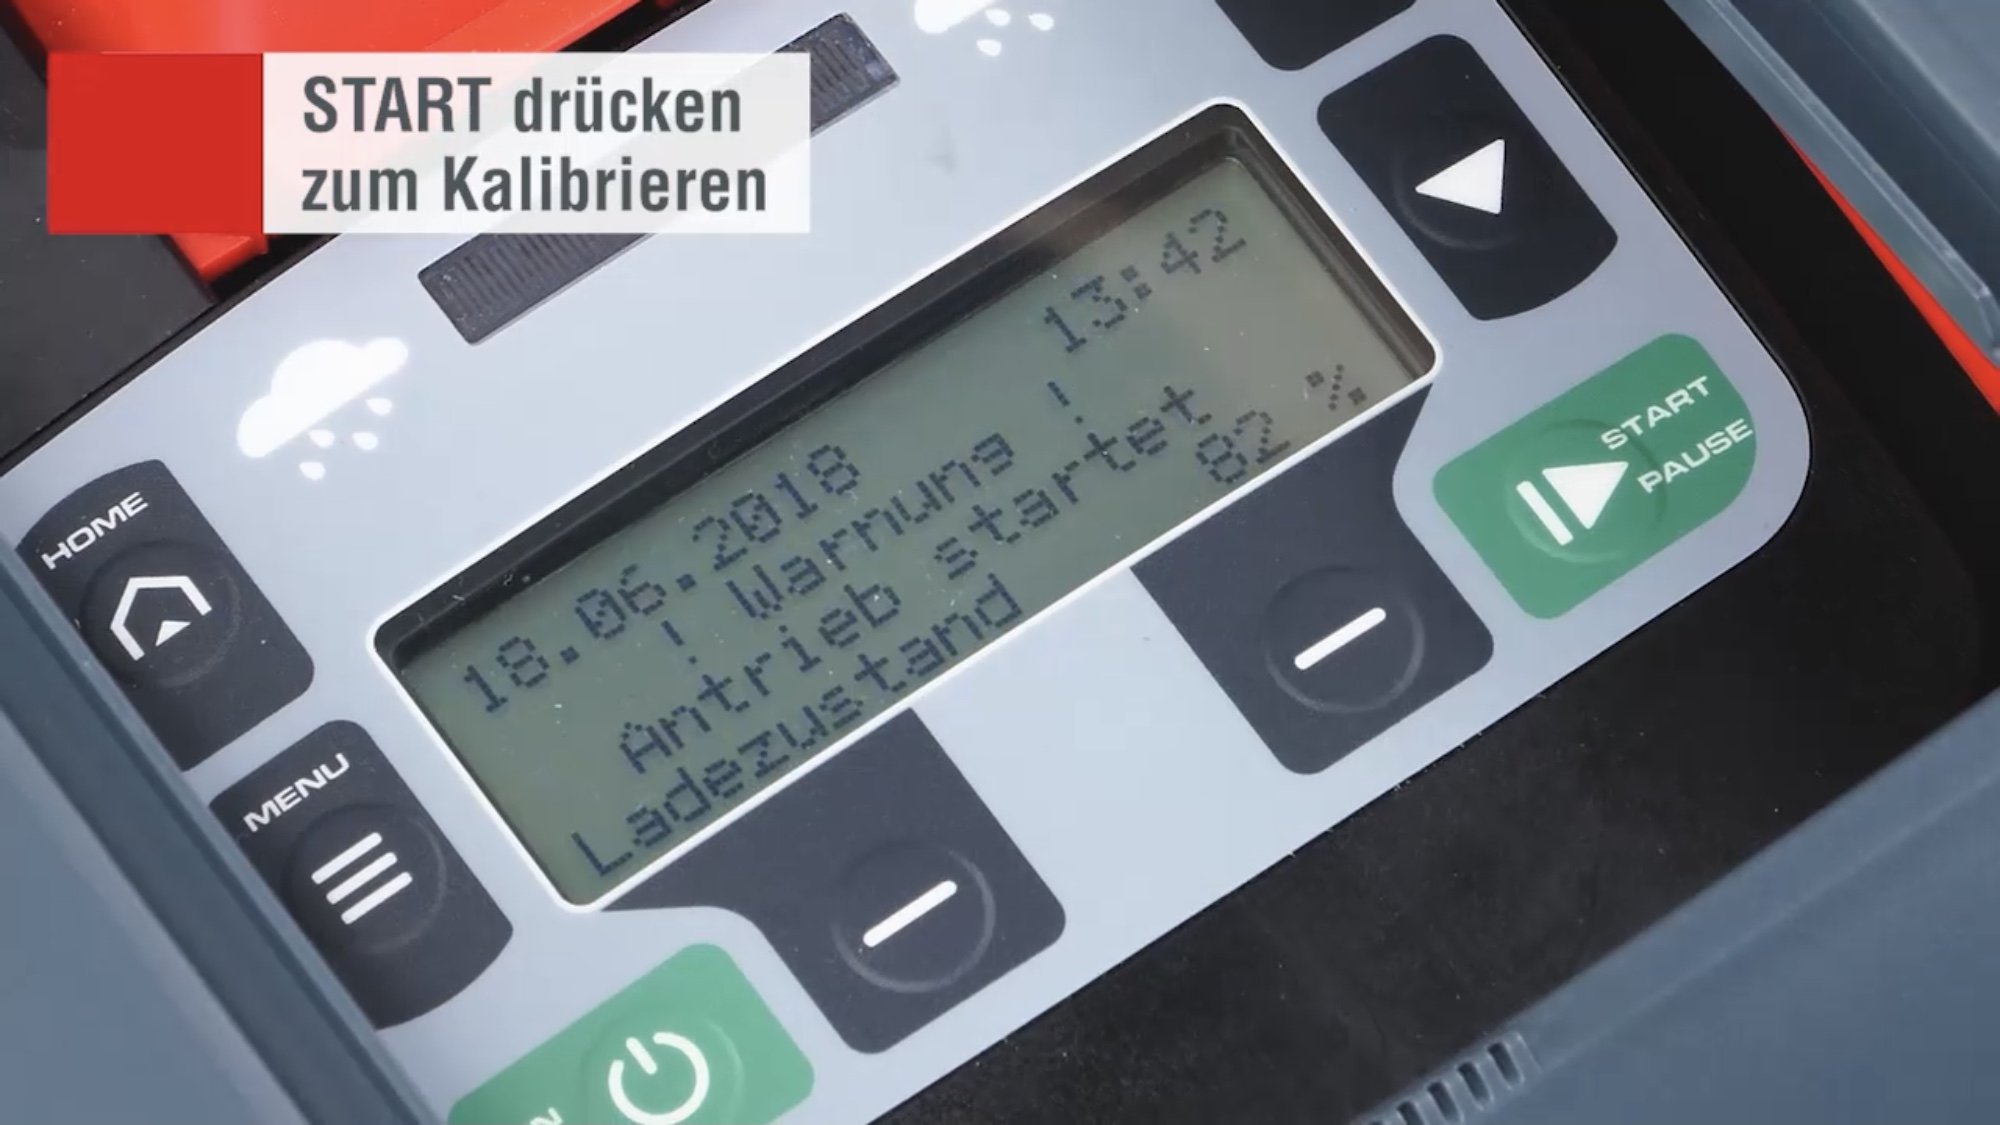 AL-KO-Robolinho-Kalibrierfahrt-starten